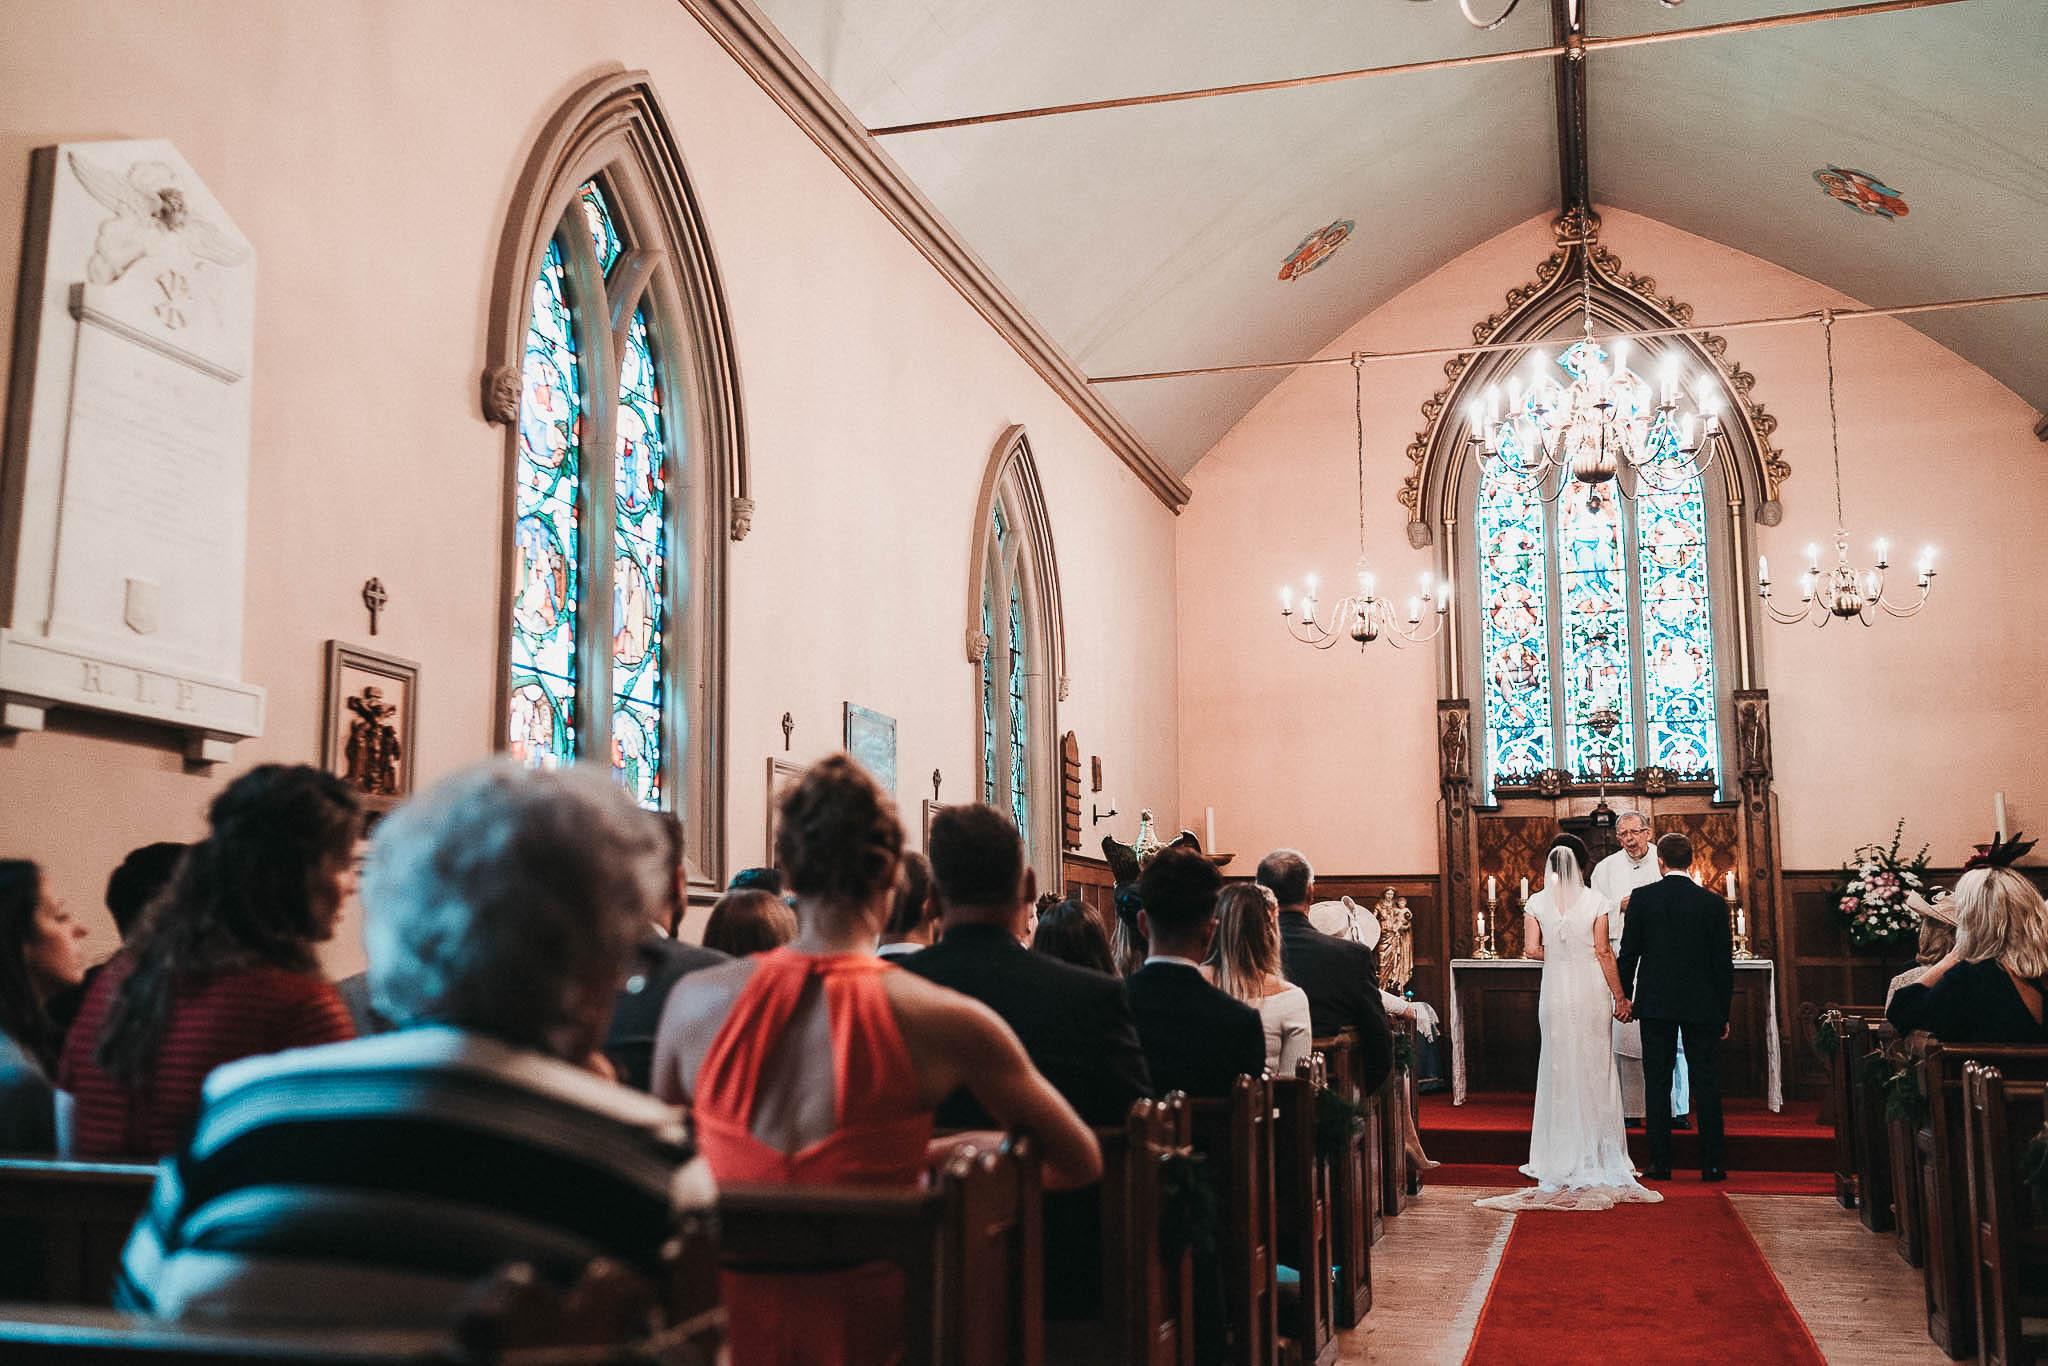 st-marys-harvington-wedding